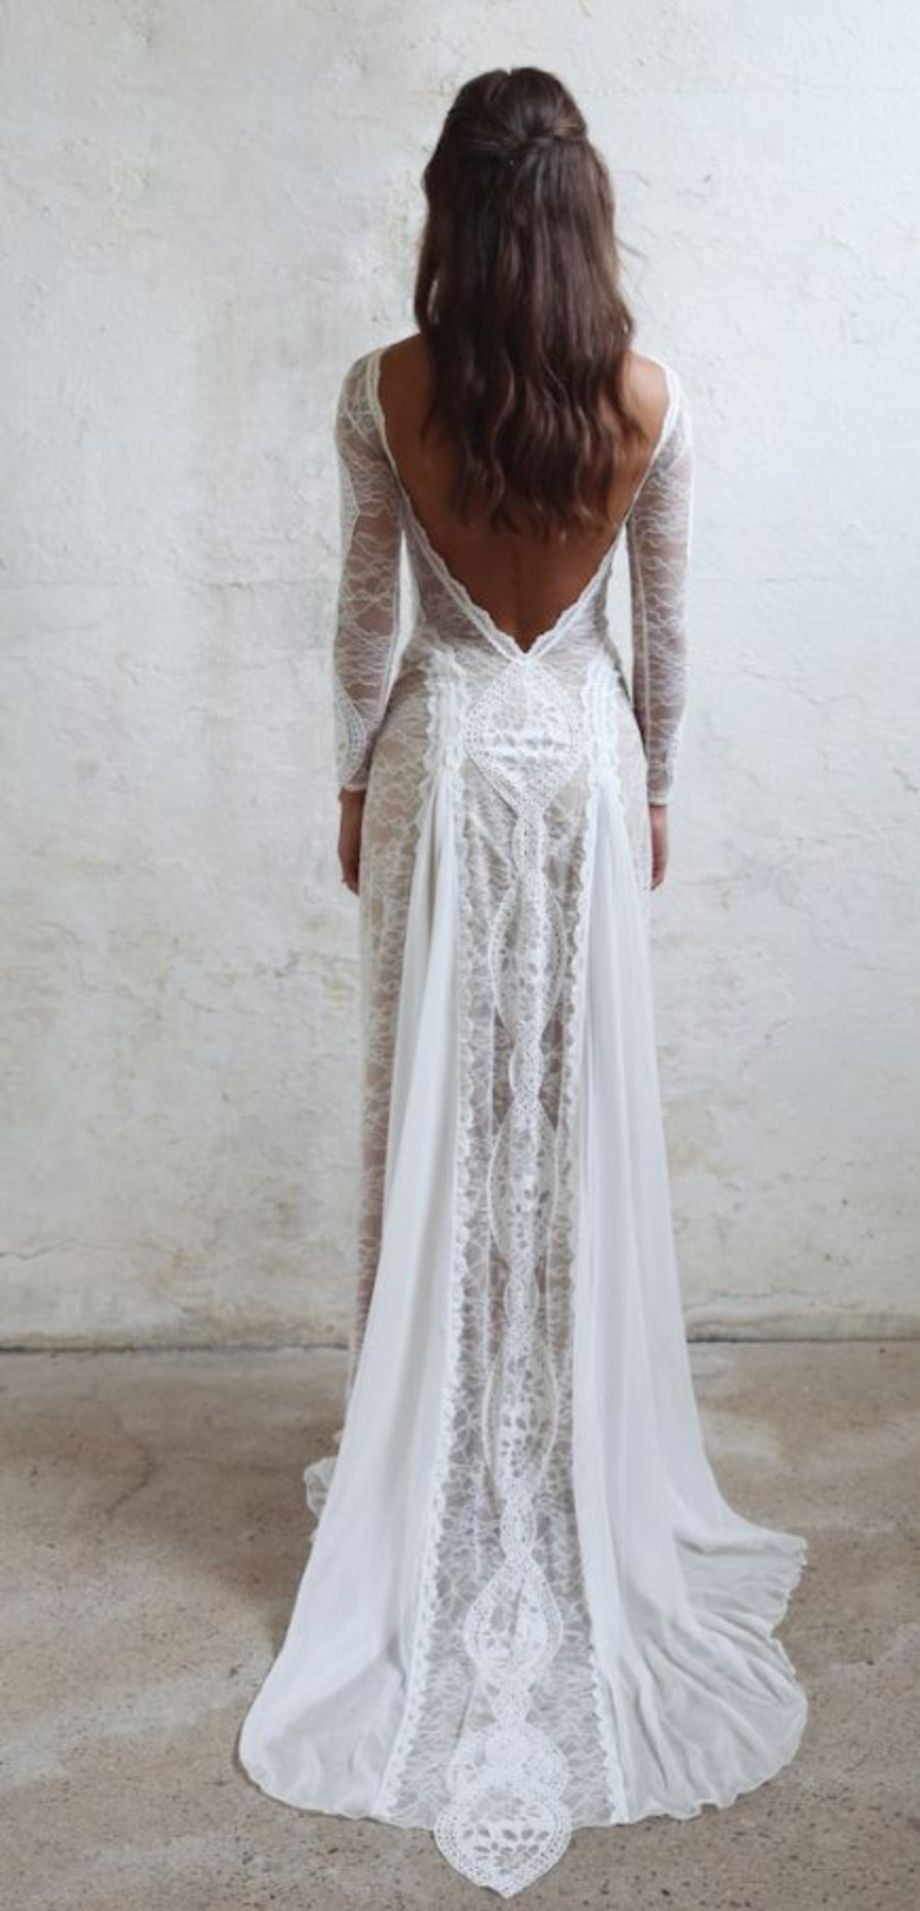 Cool cute and simple satin sleeve wedding dress ideas